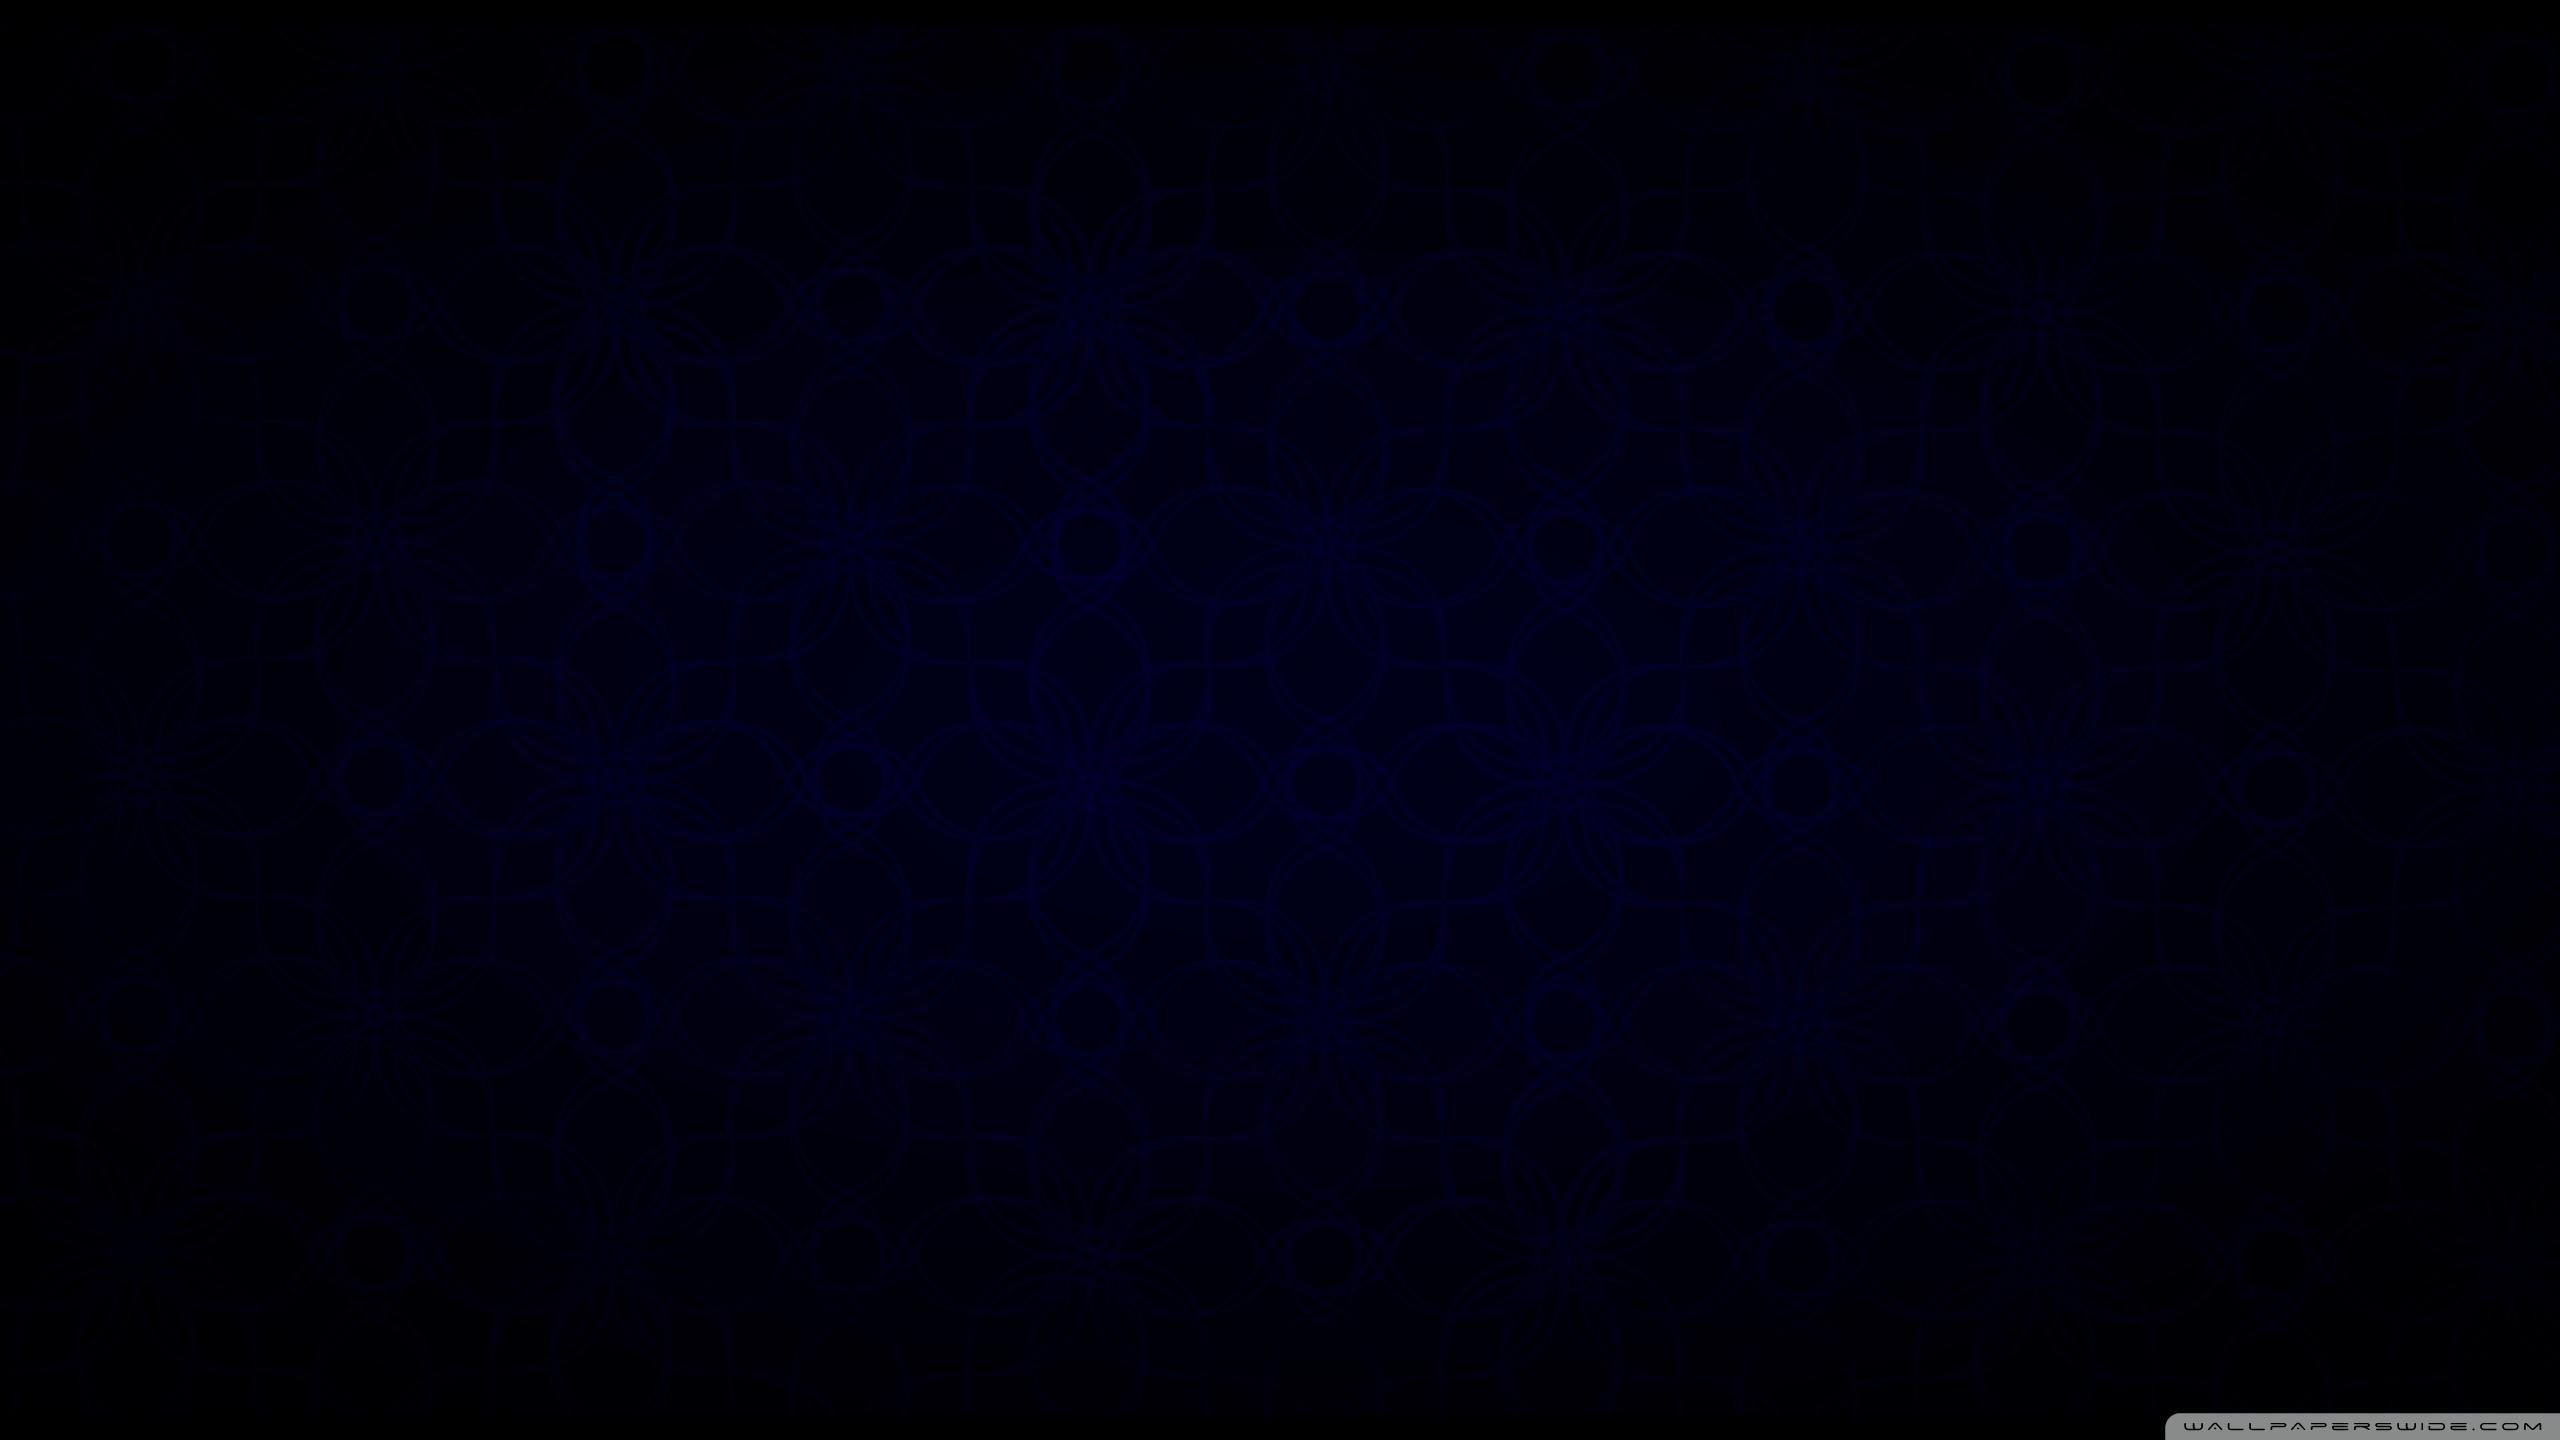 Download Dark Blue Vintage, Pattern, Black, HD Wallpaper And FREE  Stock Photo